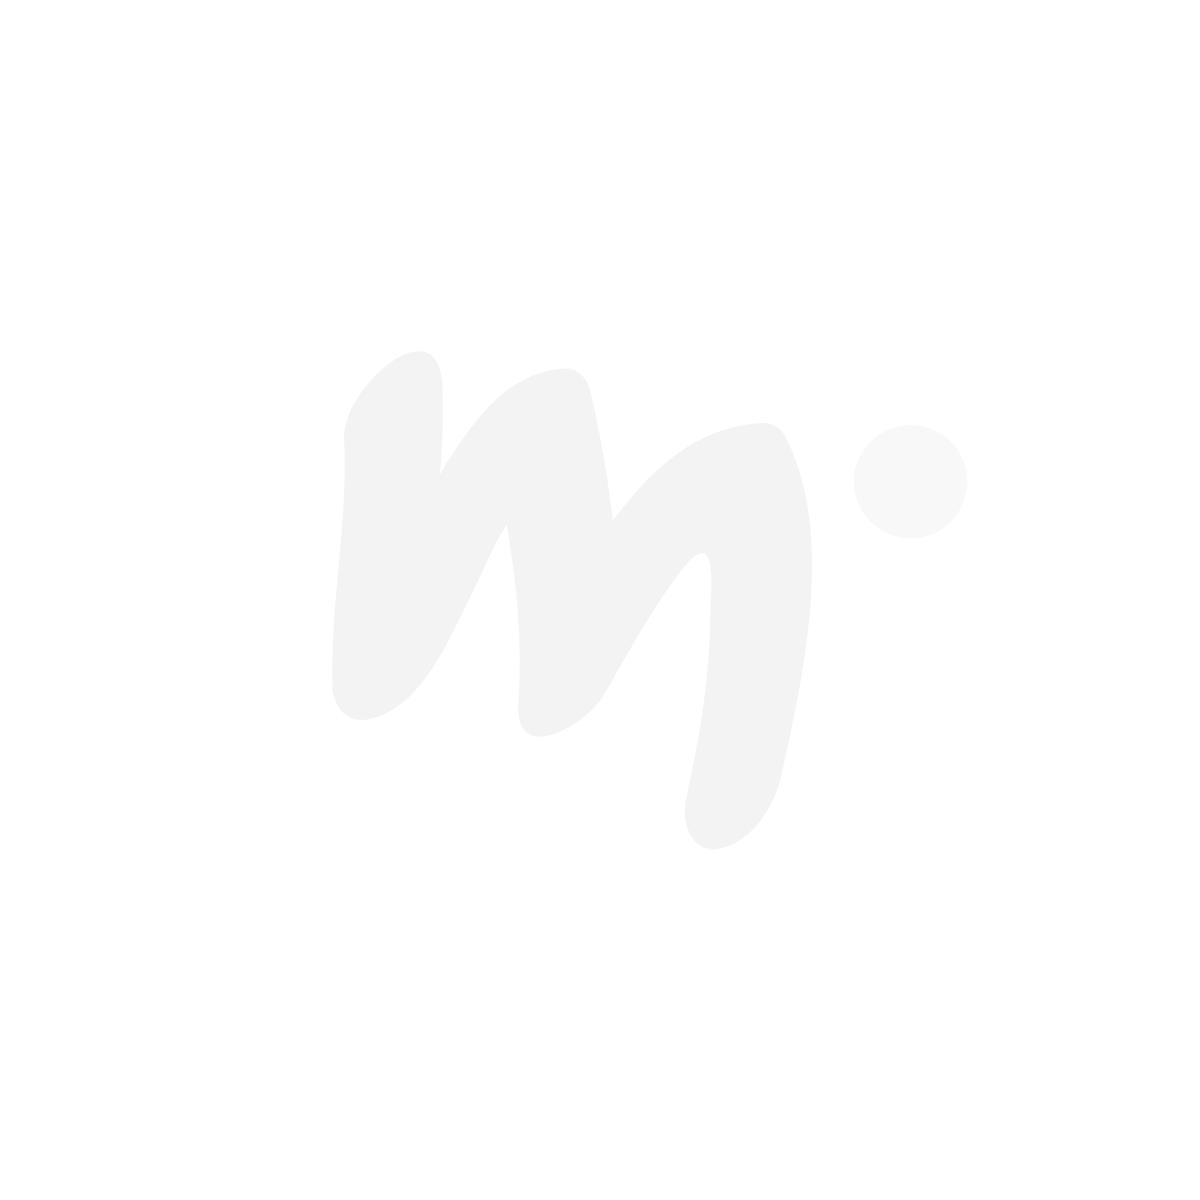 Mx Deco Koristetonttu valkoinen 15 cm